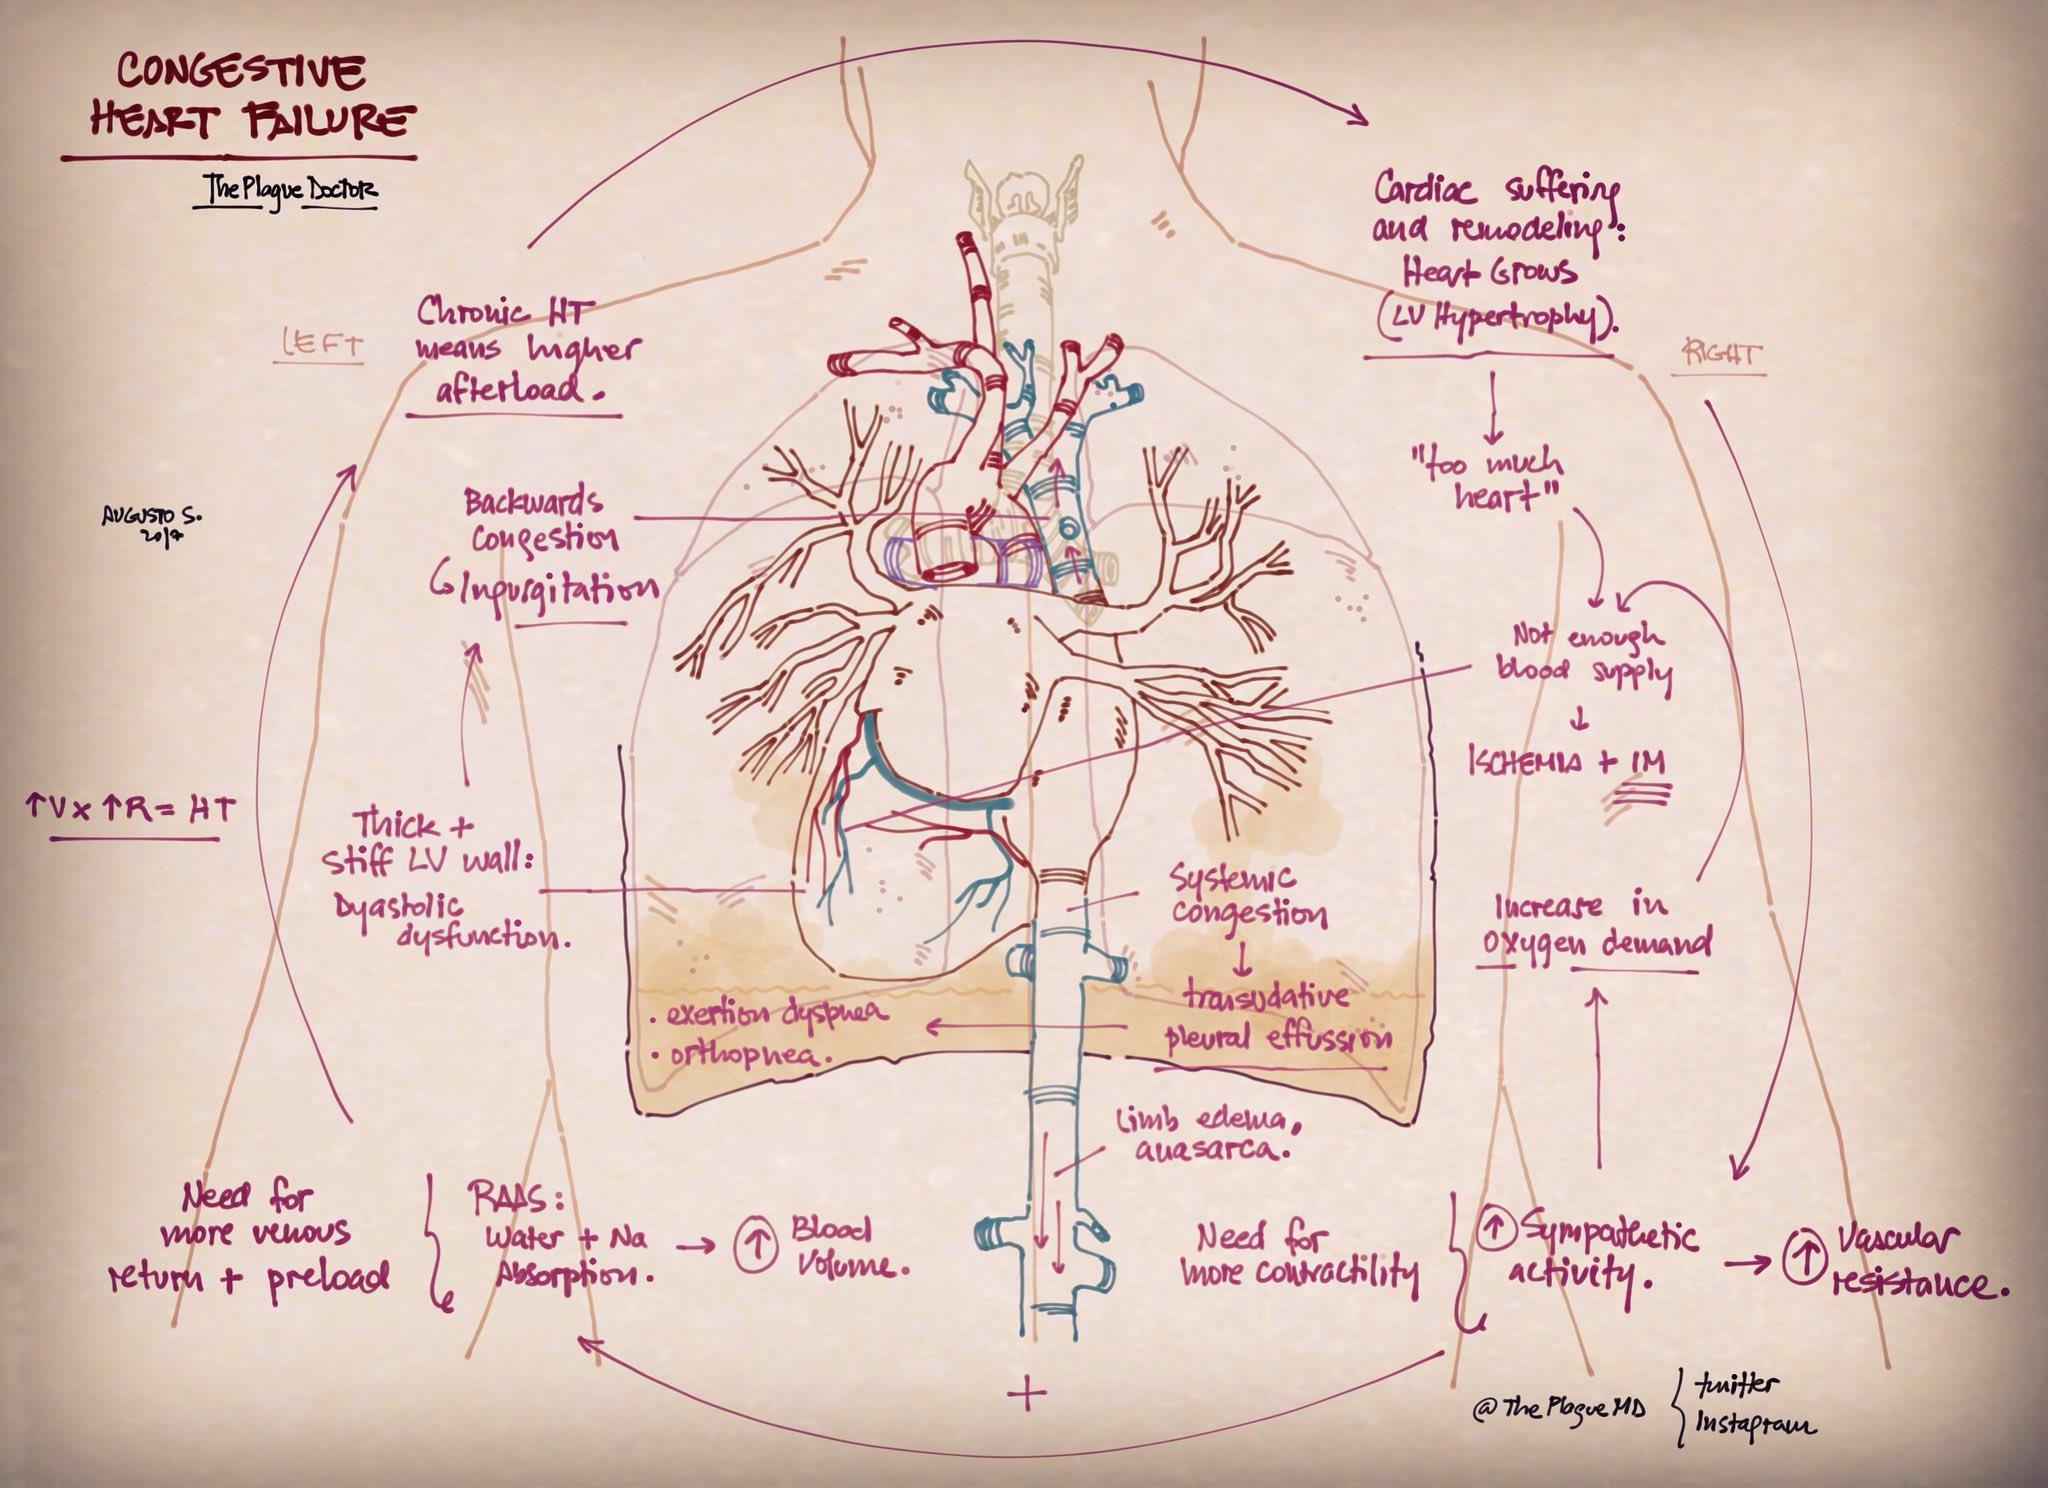 Congestive heart failure #pathophysiology #cardiology #neumology   #medicine #FOAMed #FOAM #MedEd #medicalillustration #illustration #USMLE #ENARM #2MIR18 #medstudent #medstudentlife #primarycare #familymedicine #internalmedicine #medicalresidency #emergencymedicine https://t.co/iD8lVoBNZW